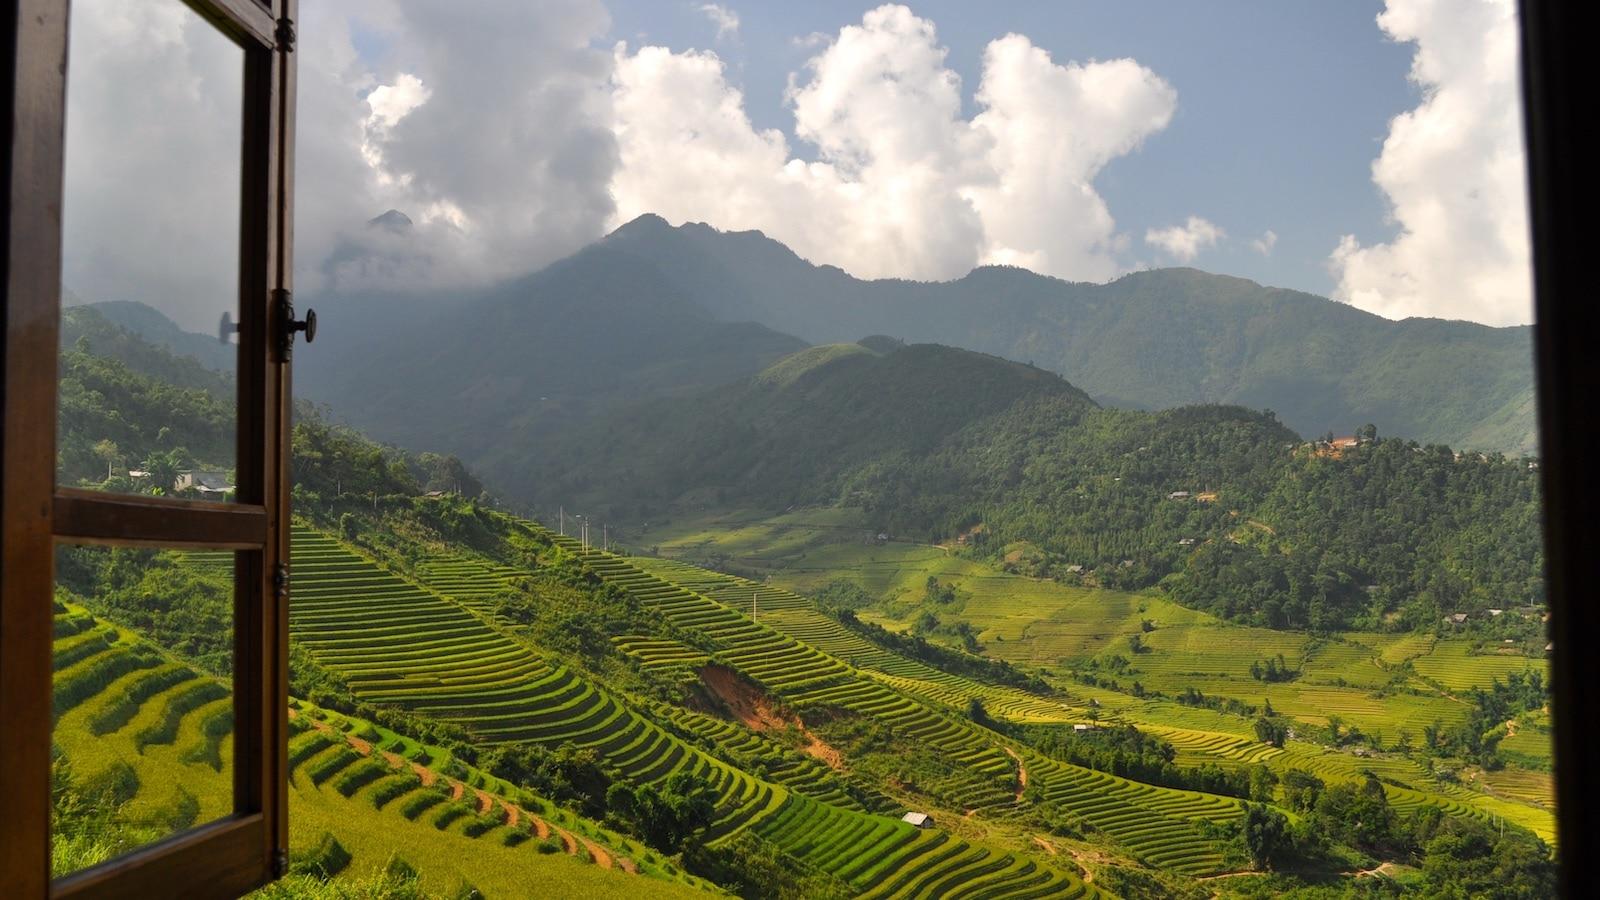 Sapa Valley Rice Field